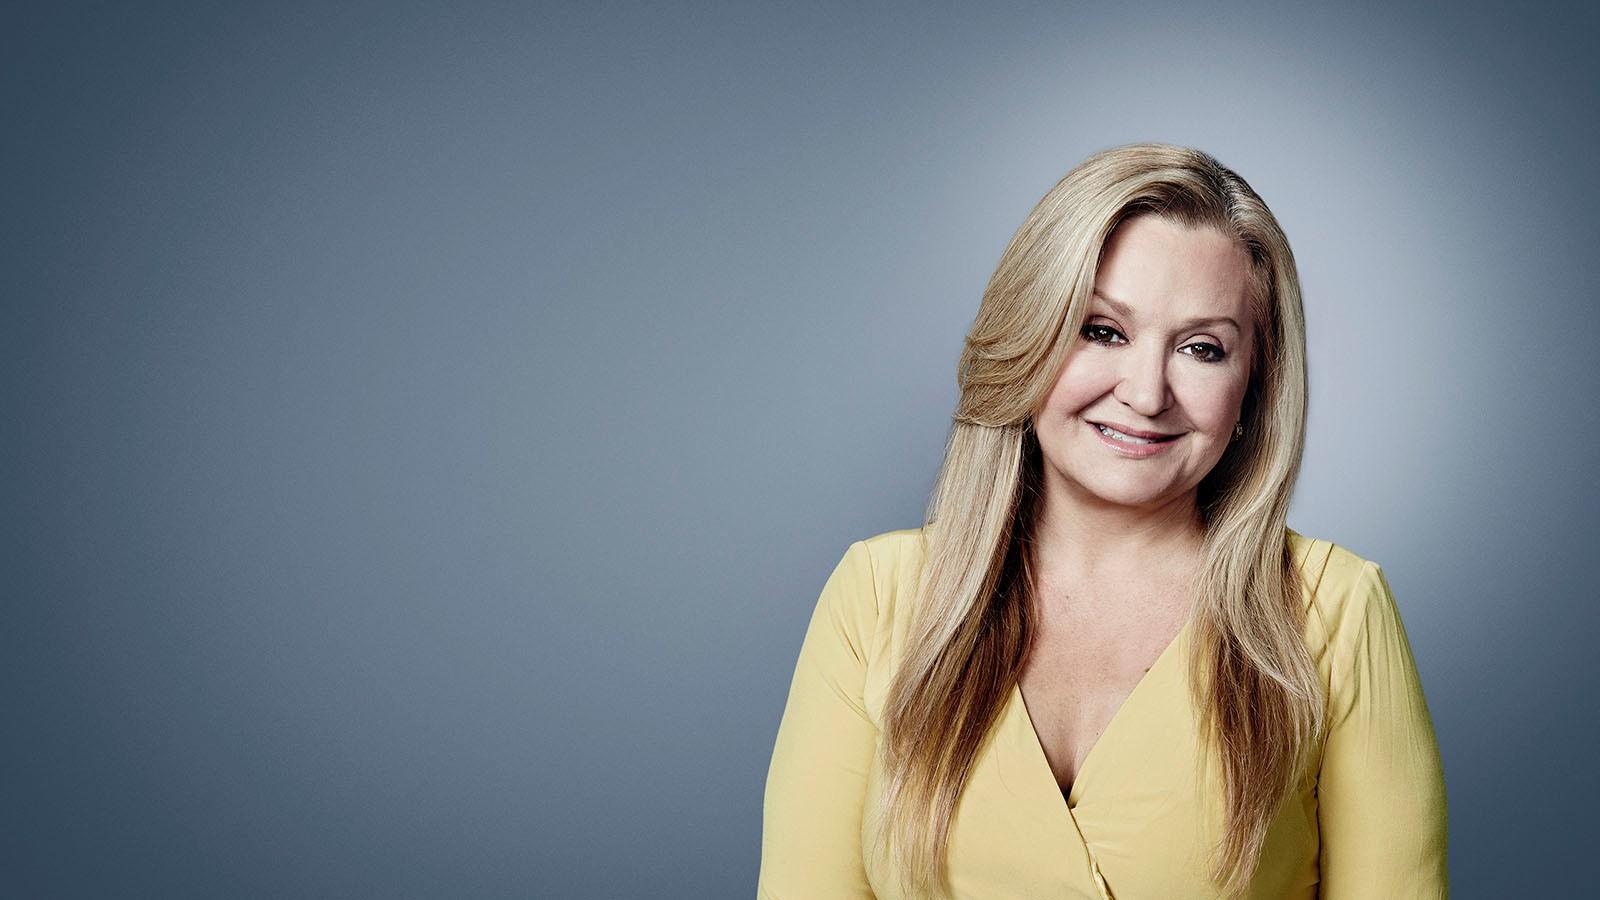 CNN Profiles - Cynthia Hudson - Senior Vice President and Managing